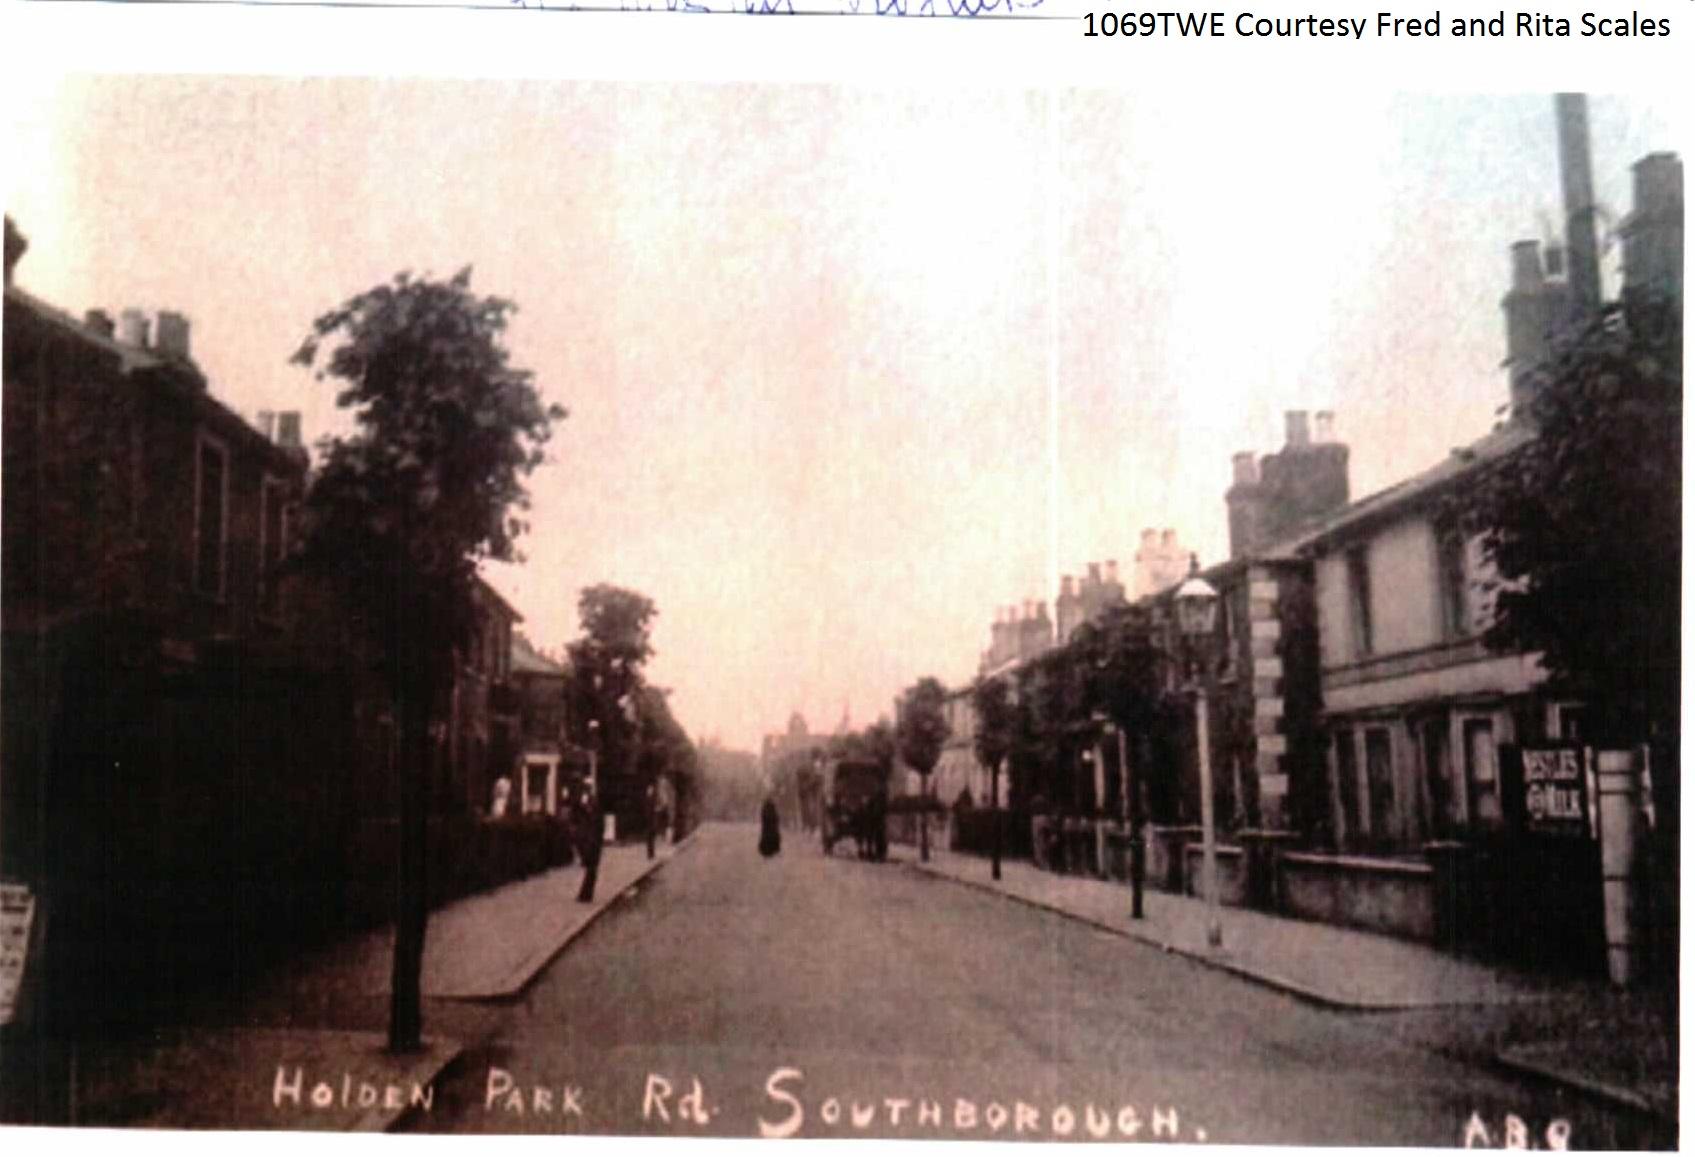 Holden Park Road